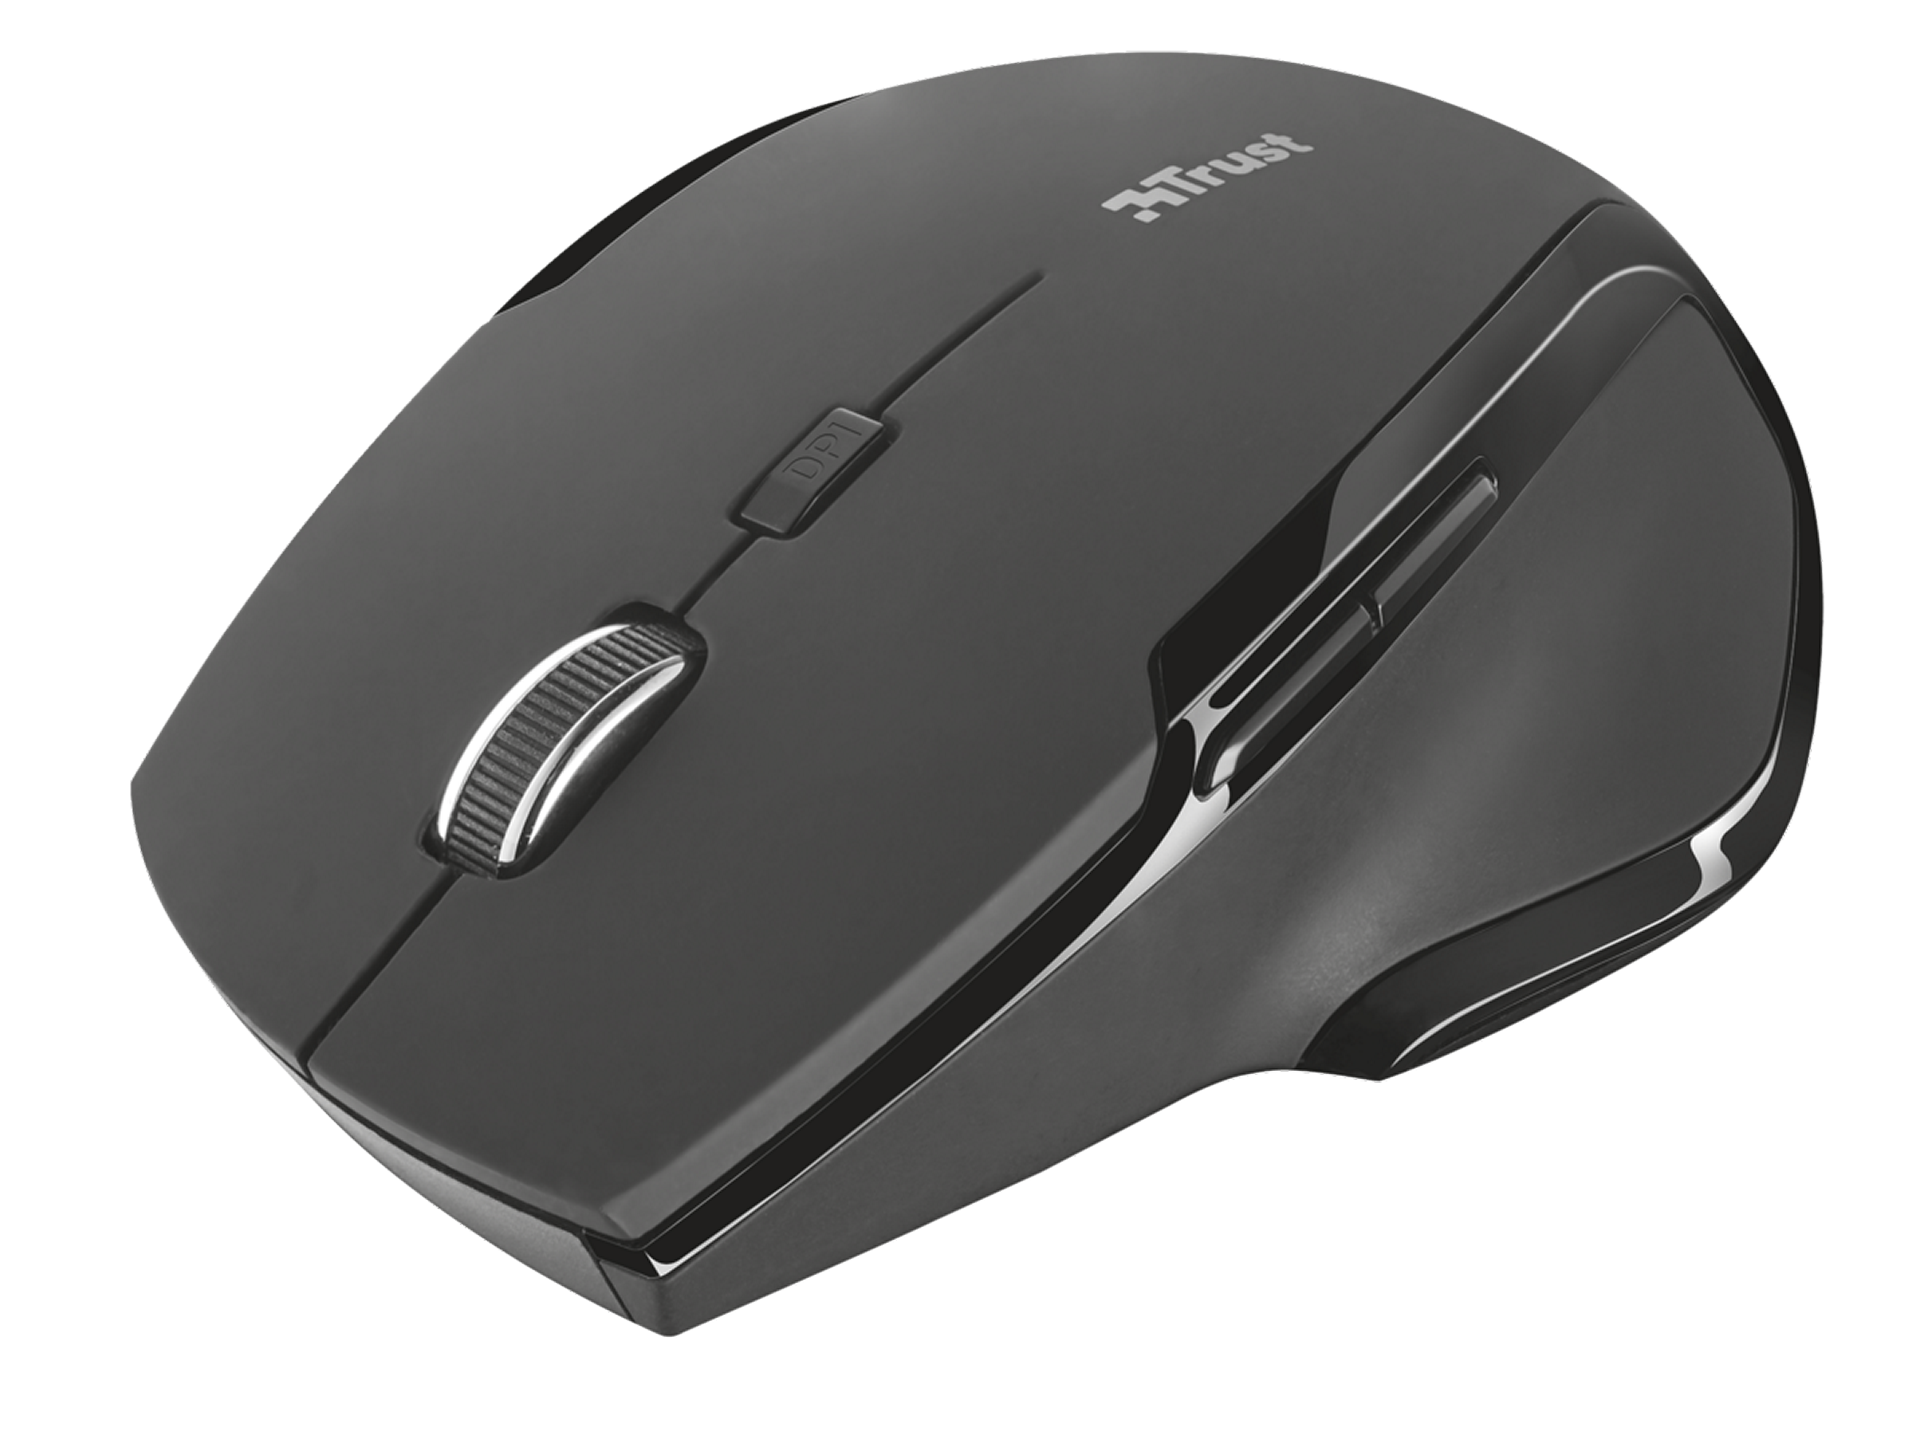 myš TRUST Evo Compact Wireless Optical Mouse